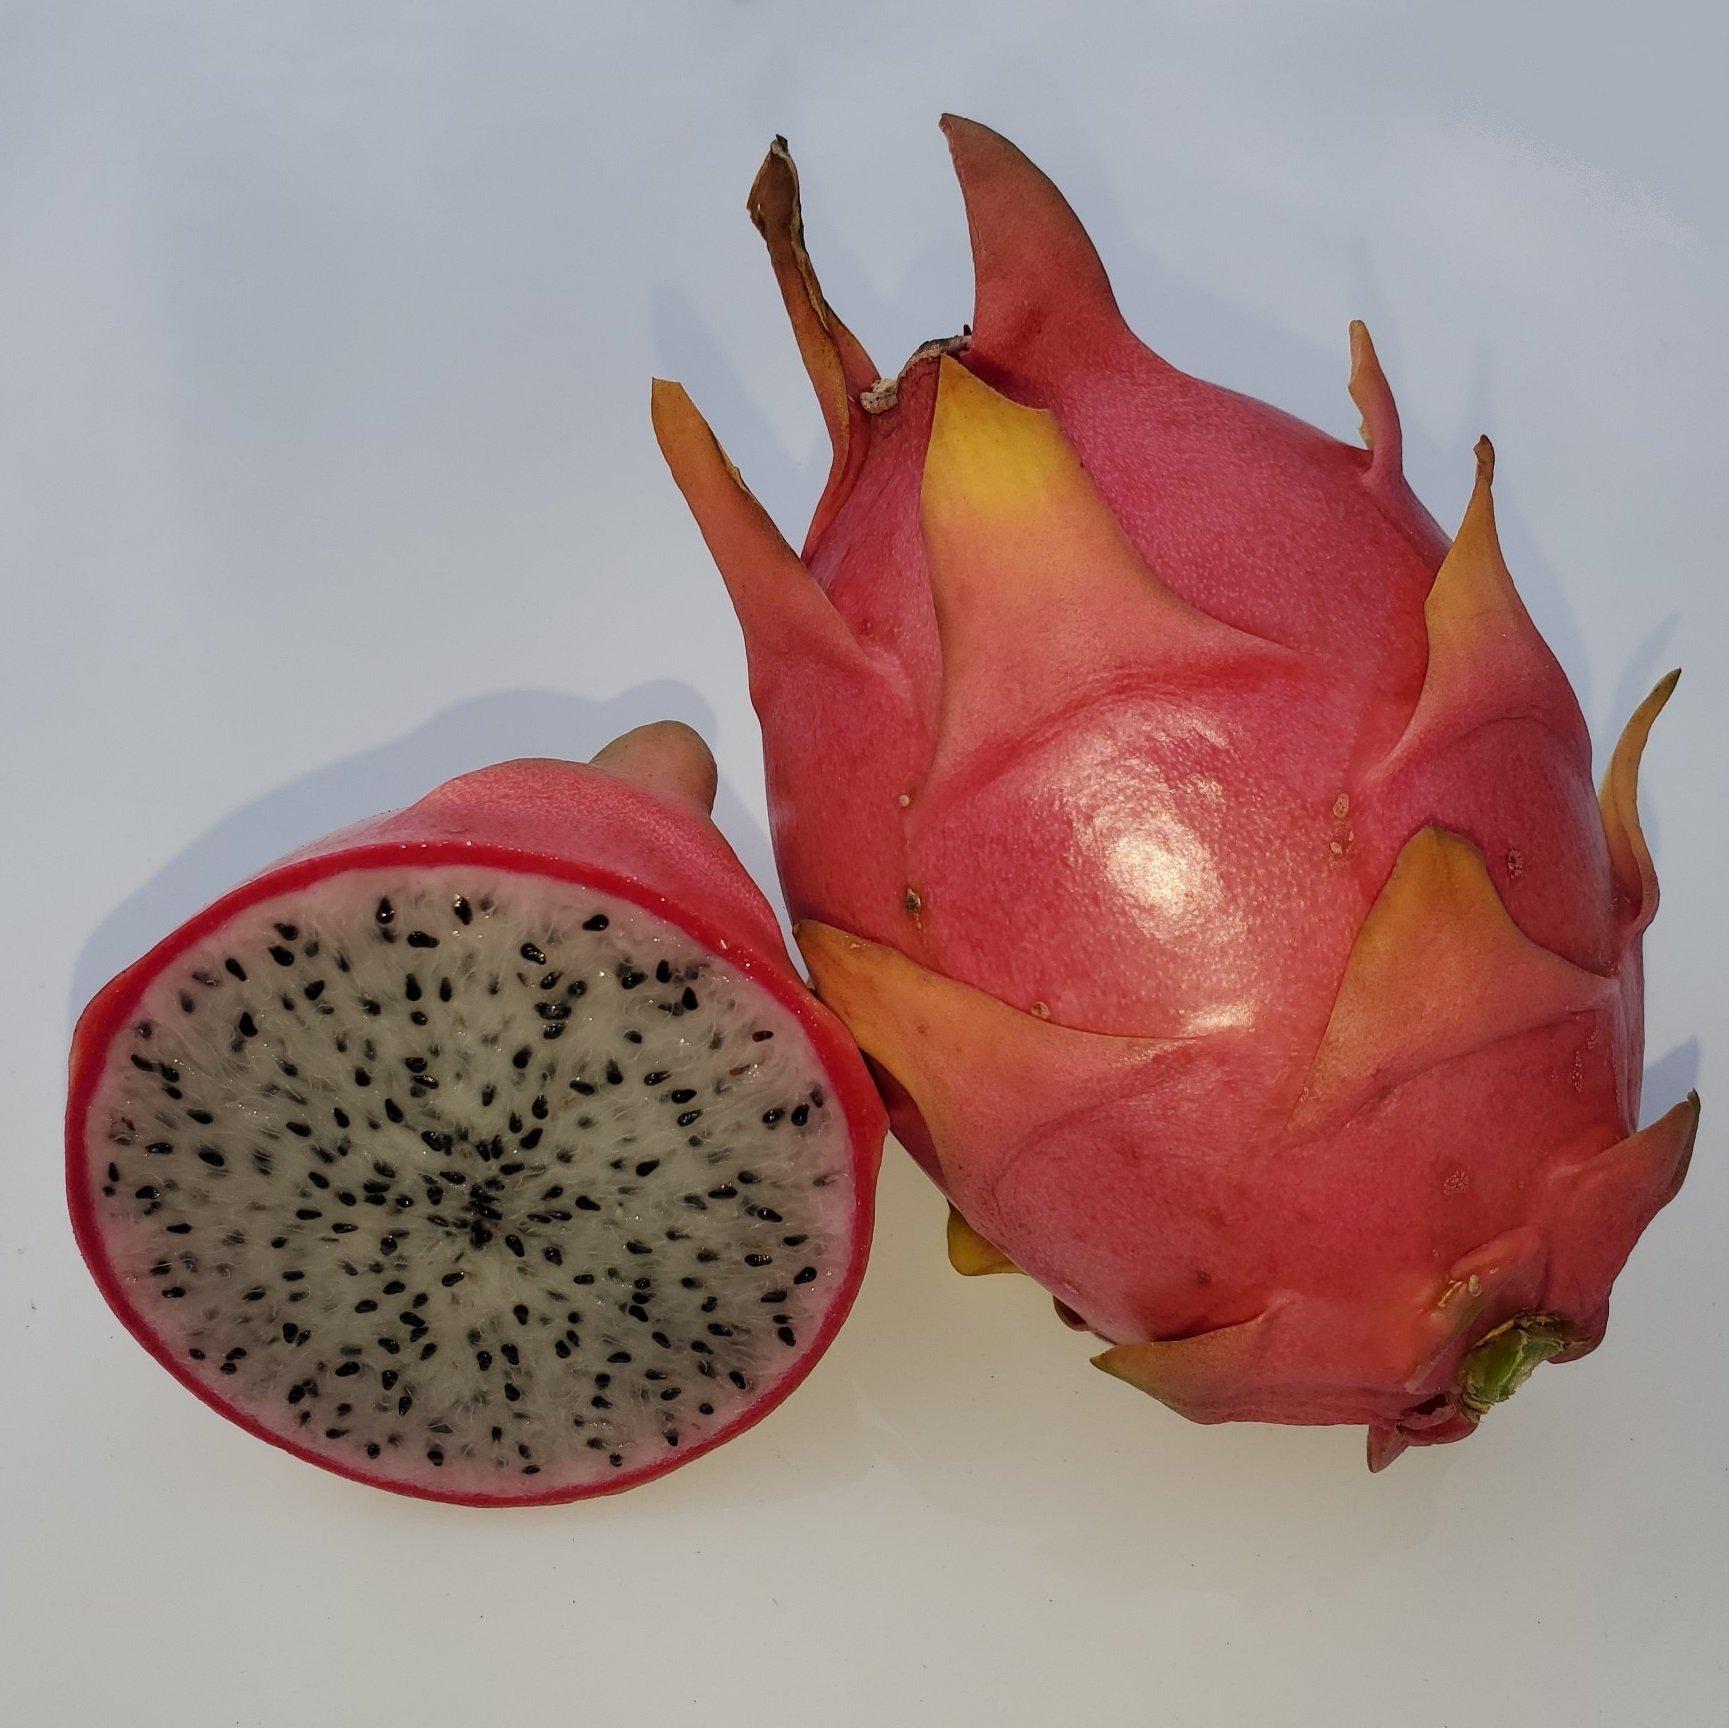 Capistrano Valley Dragon Fruit Sliced